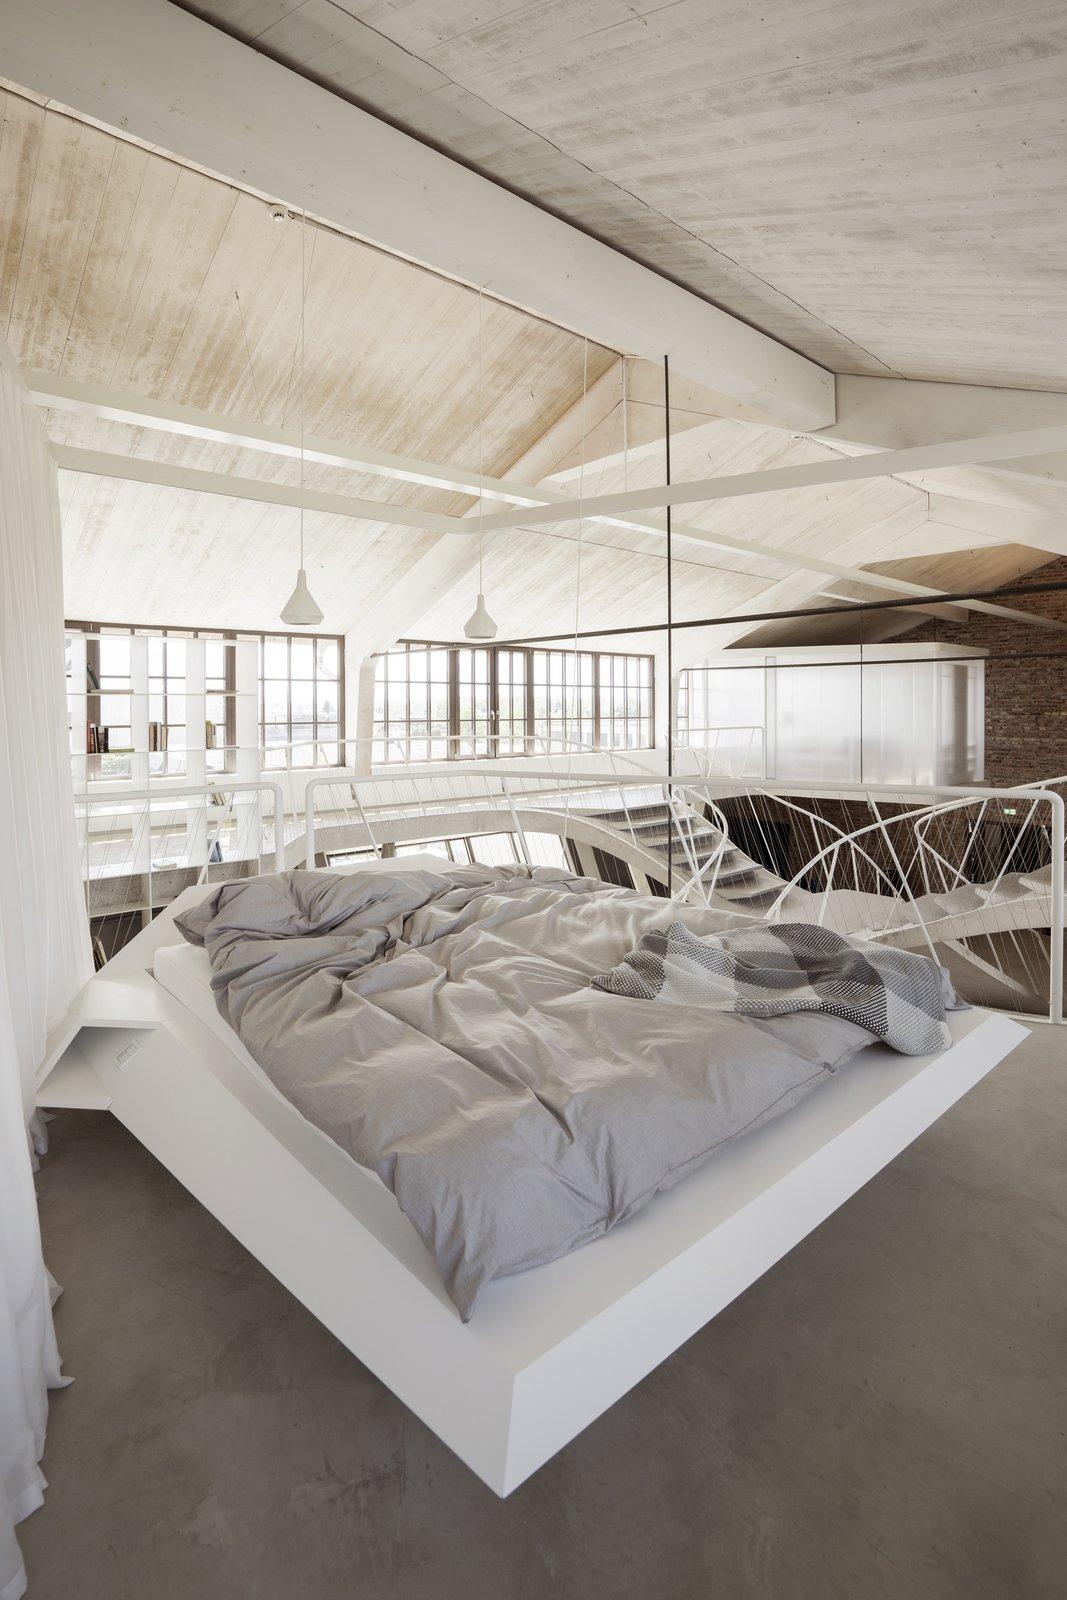 Loft Panzerhalle bedroom